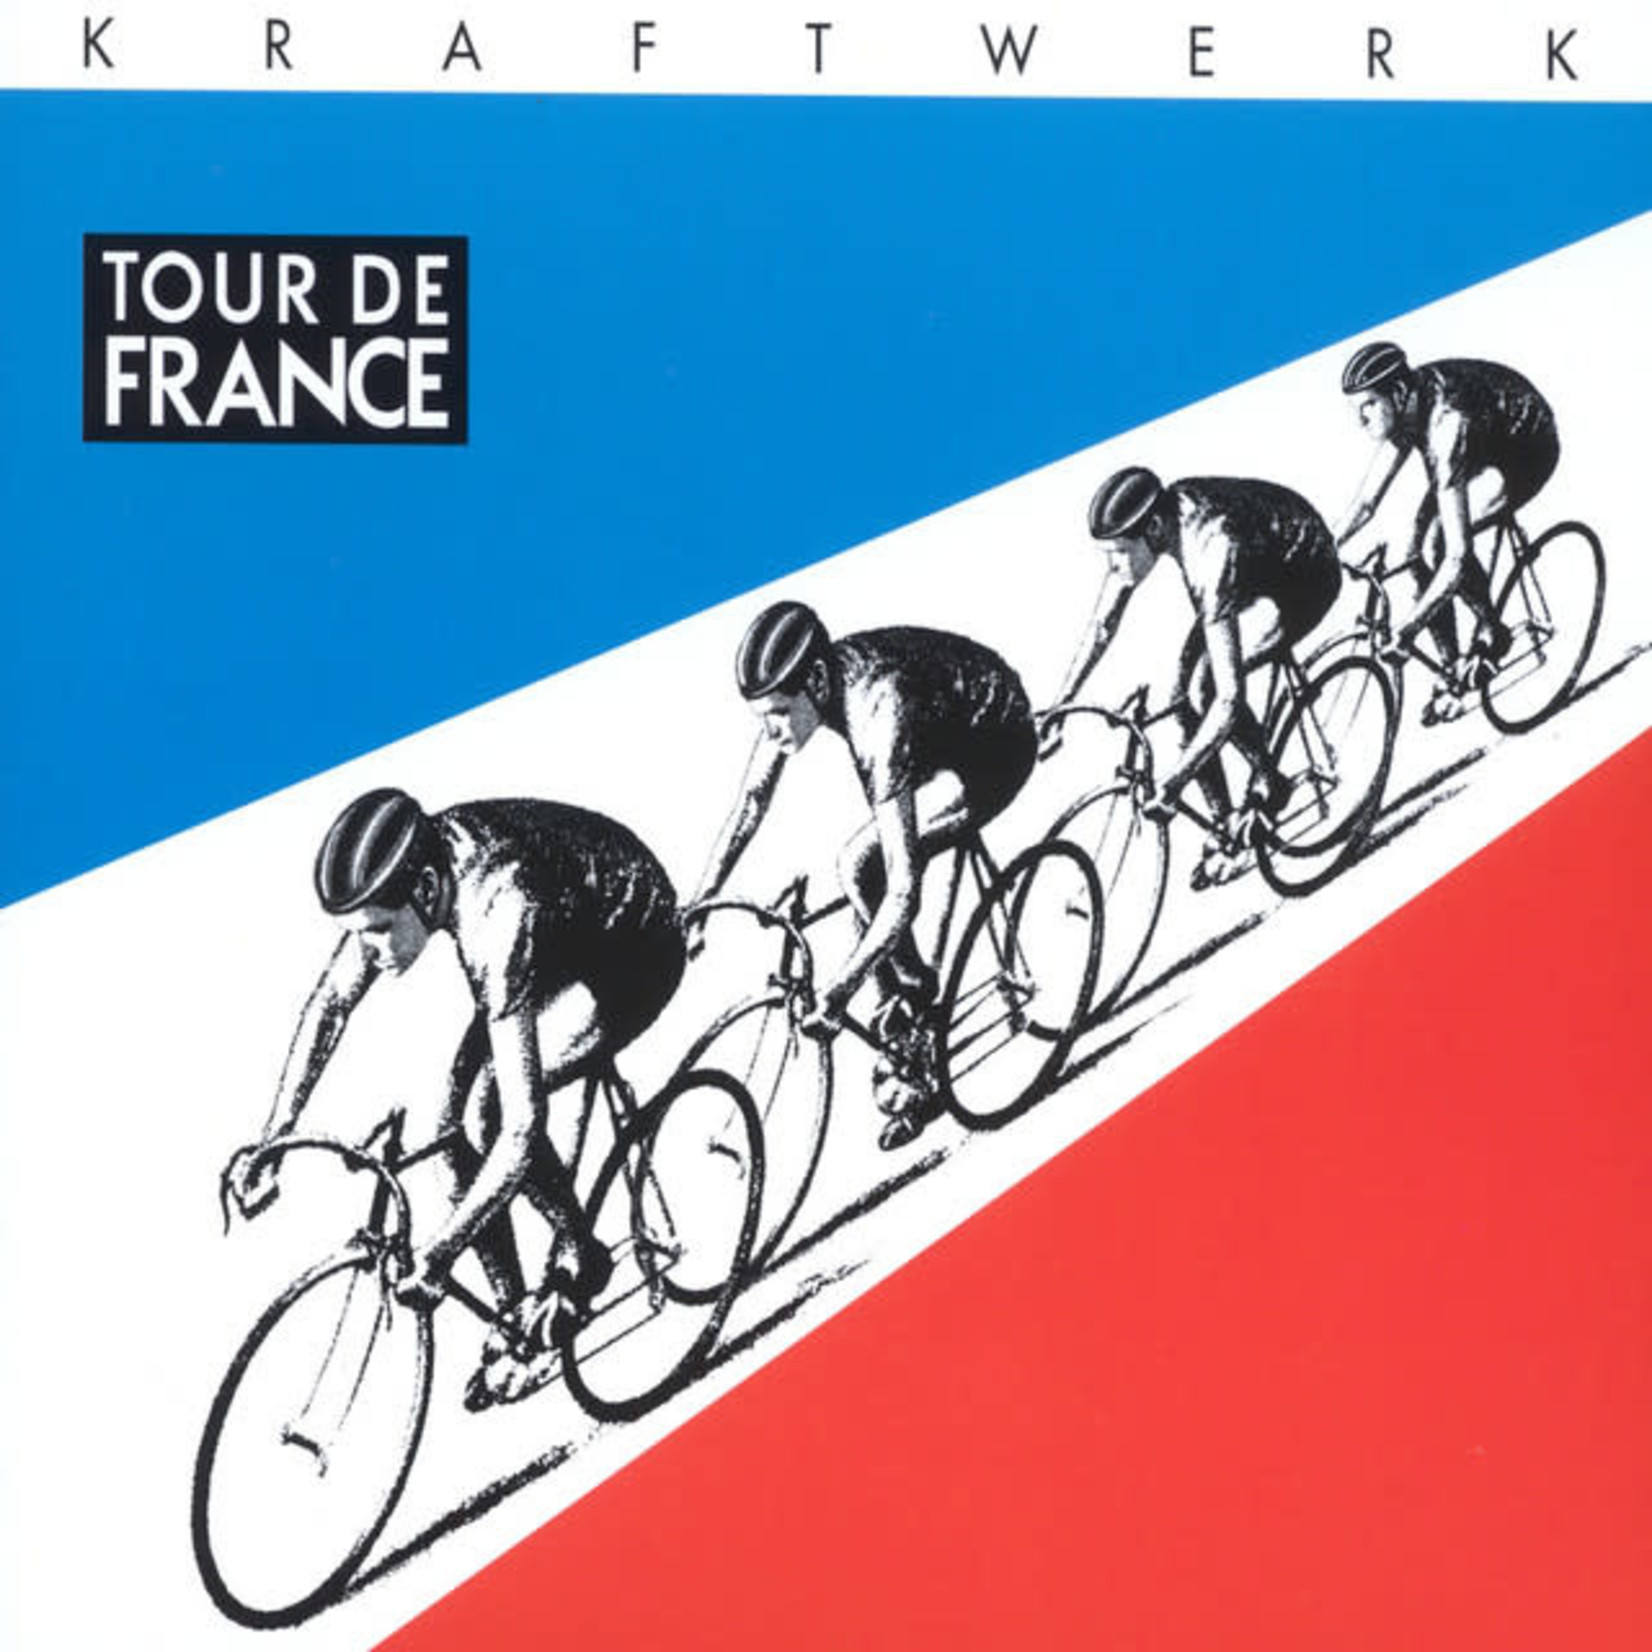 Vinyl Kraftwerk - Tour De France.  Final Sale